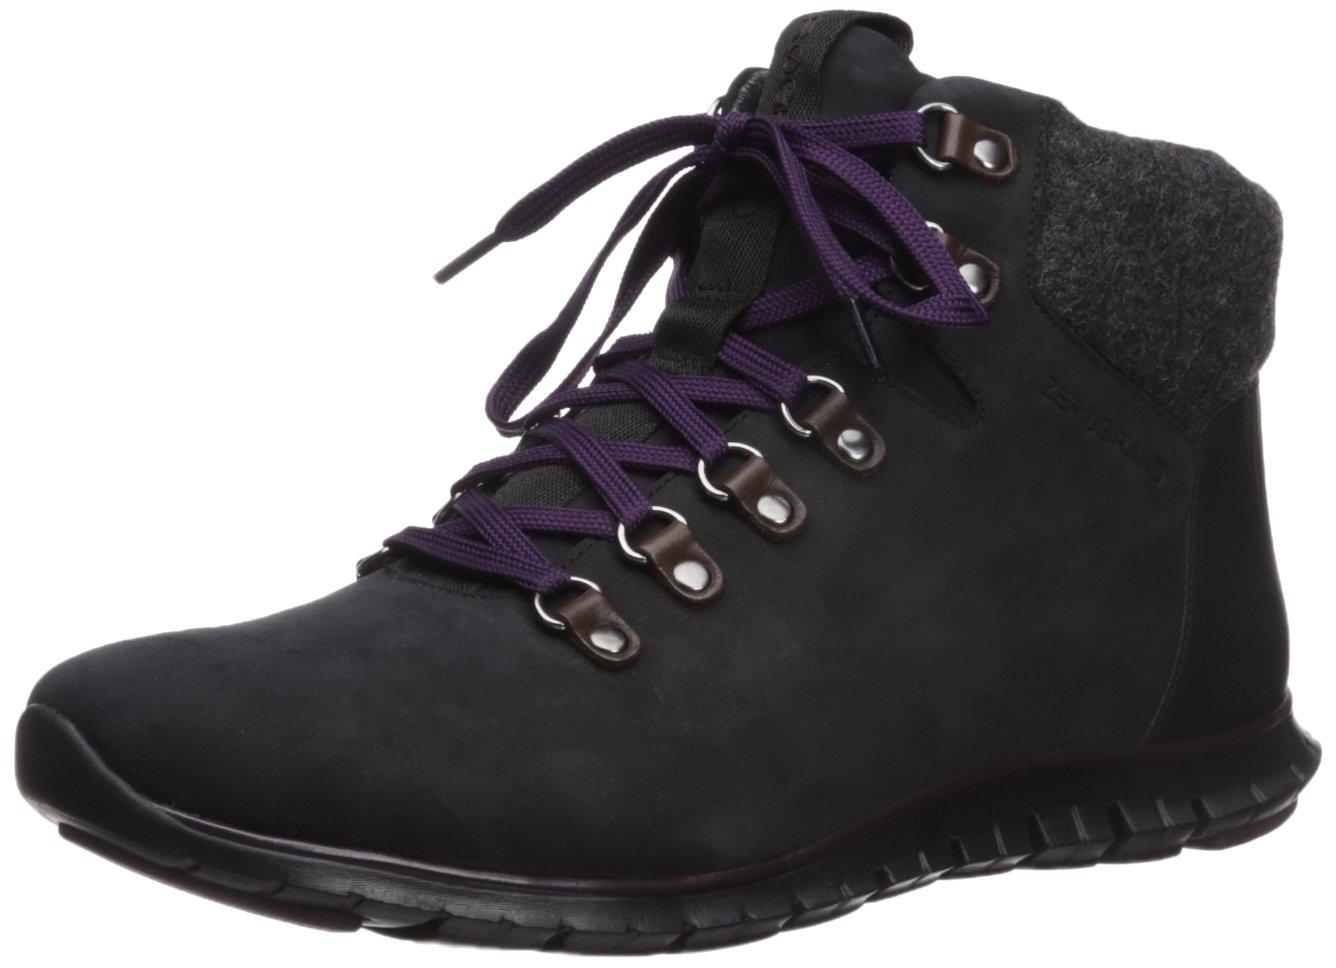 Cole Haan Women's Zerogrand Hikr Boot B016OL1ARK 8 B(M) US|Black